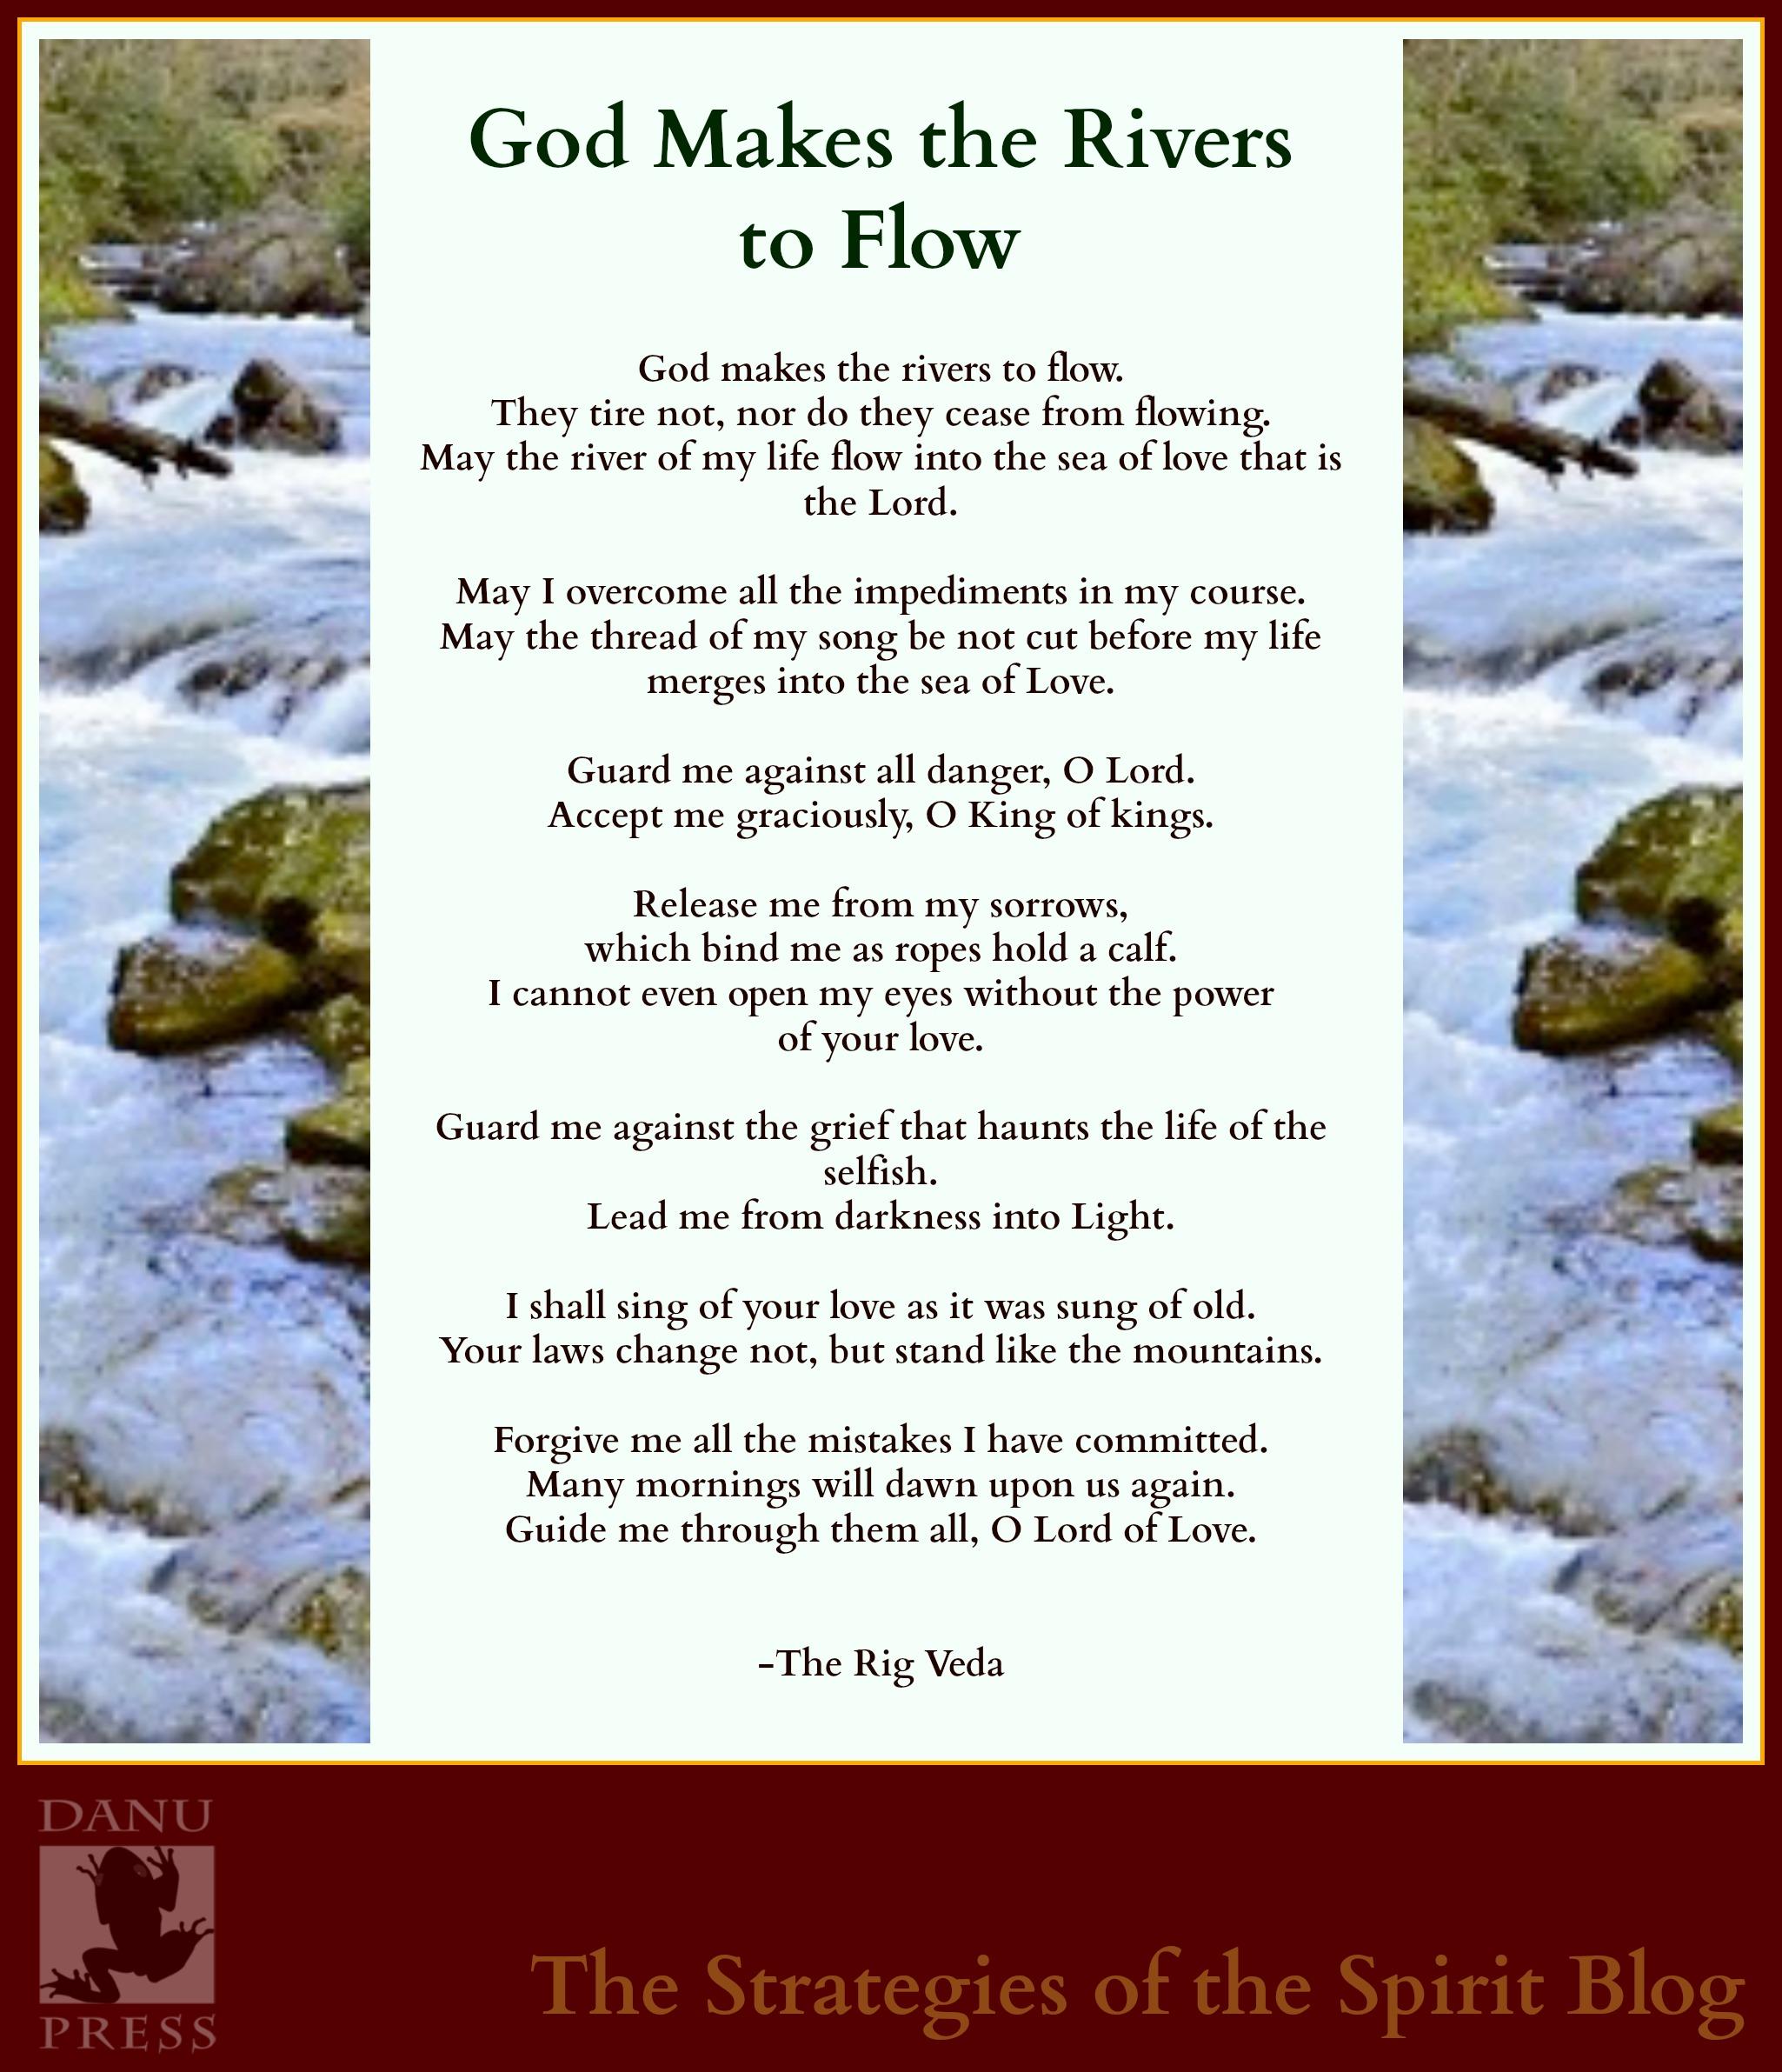 invocation prayer